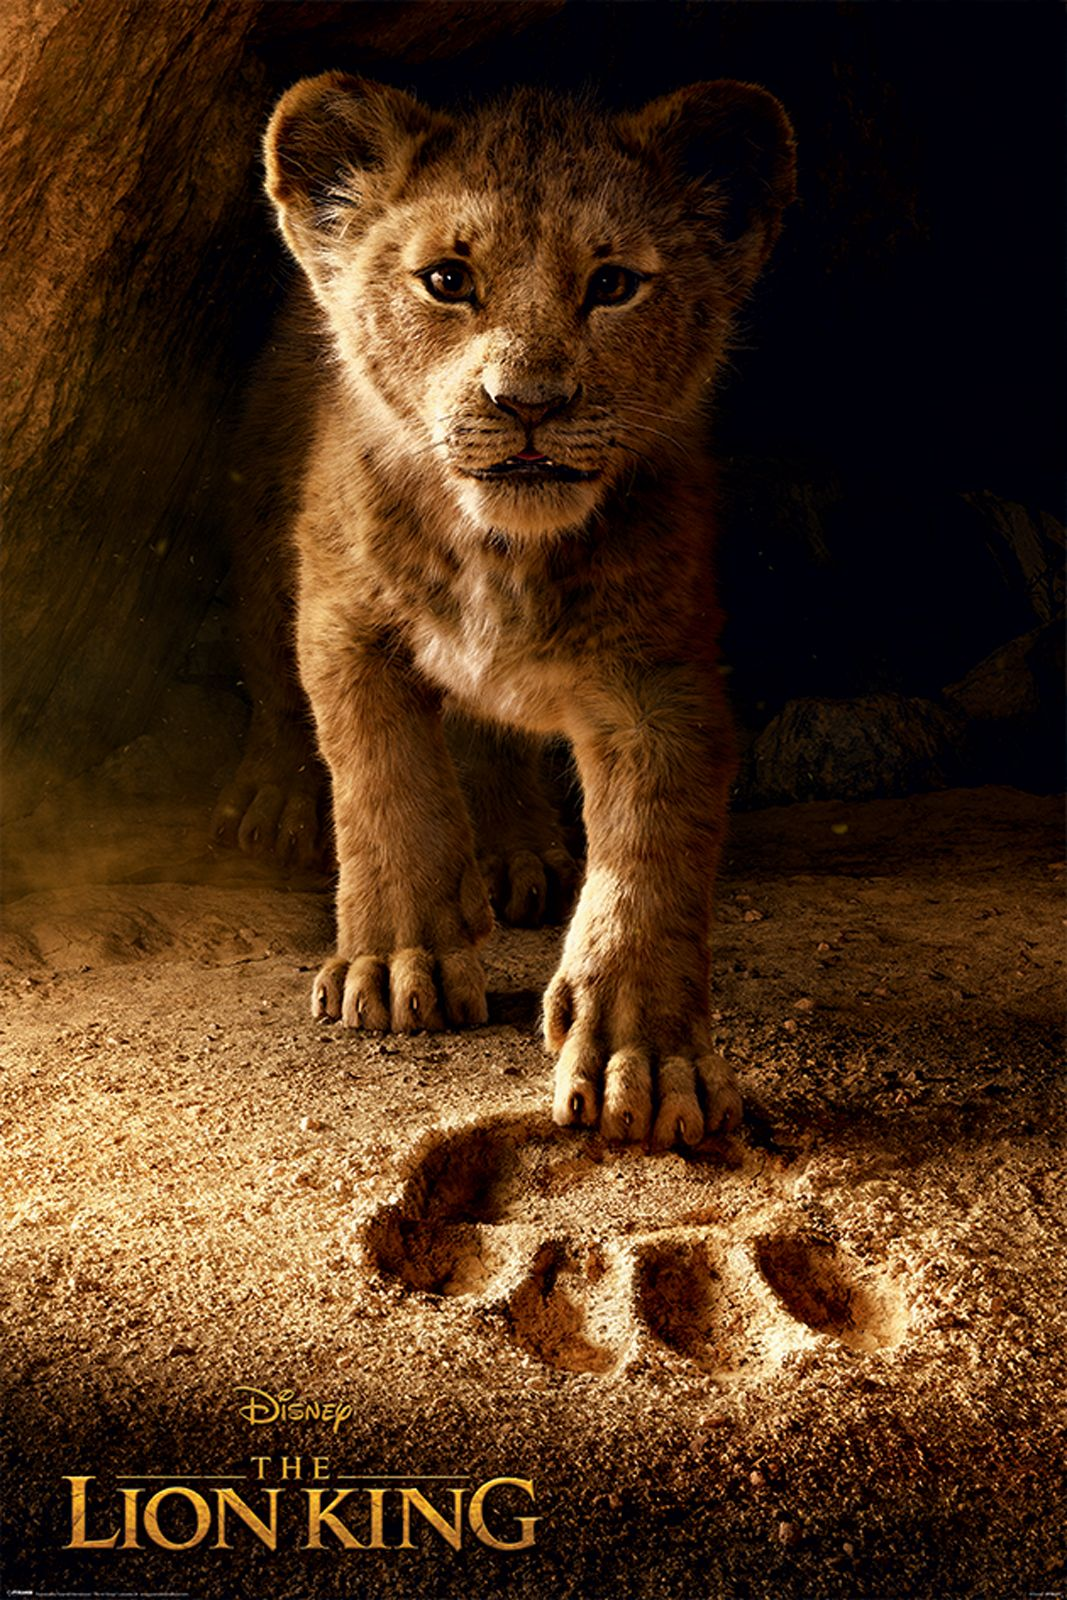 El Rey León (2019) Pp34477-the-lion-king-movie-future-king-maxi-poster-copy-jpg